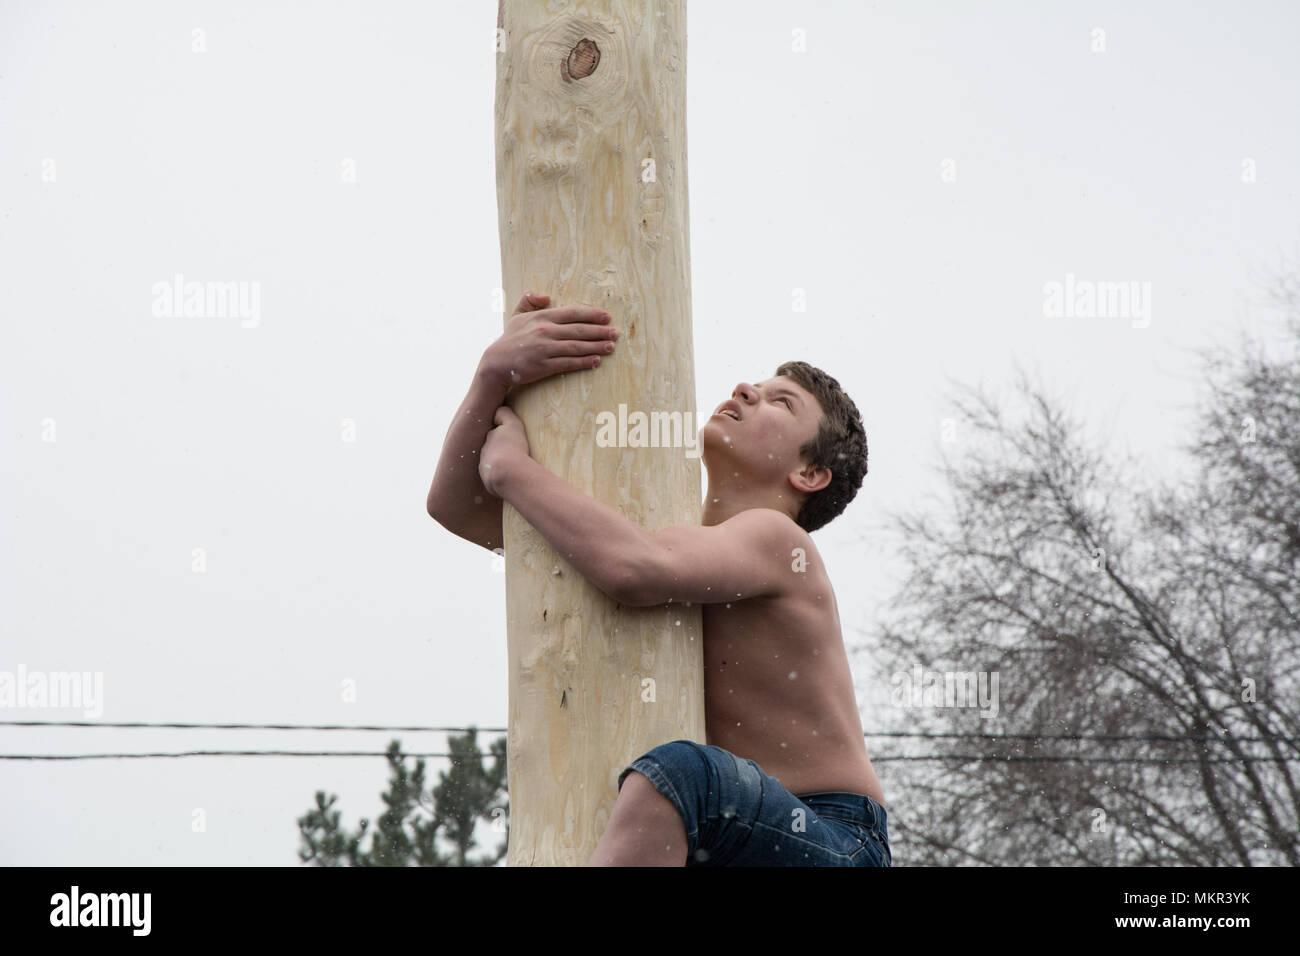 TIRASPOL, MOLDOVA-FEBRUARY 18, 2018: Boy climbing on a wooden pole for the prize. Slavonic folk pagan holiday Maslenitsa (Shrovetide) - a symbolic mee - Stock Image